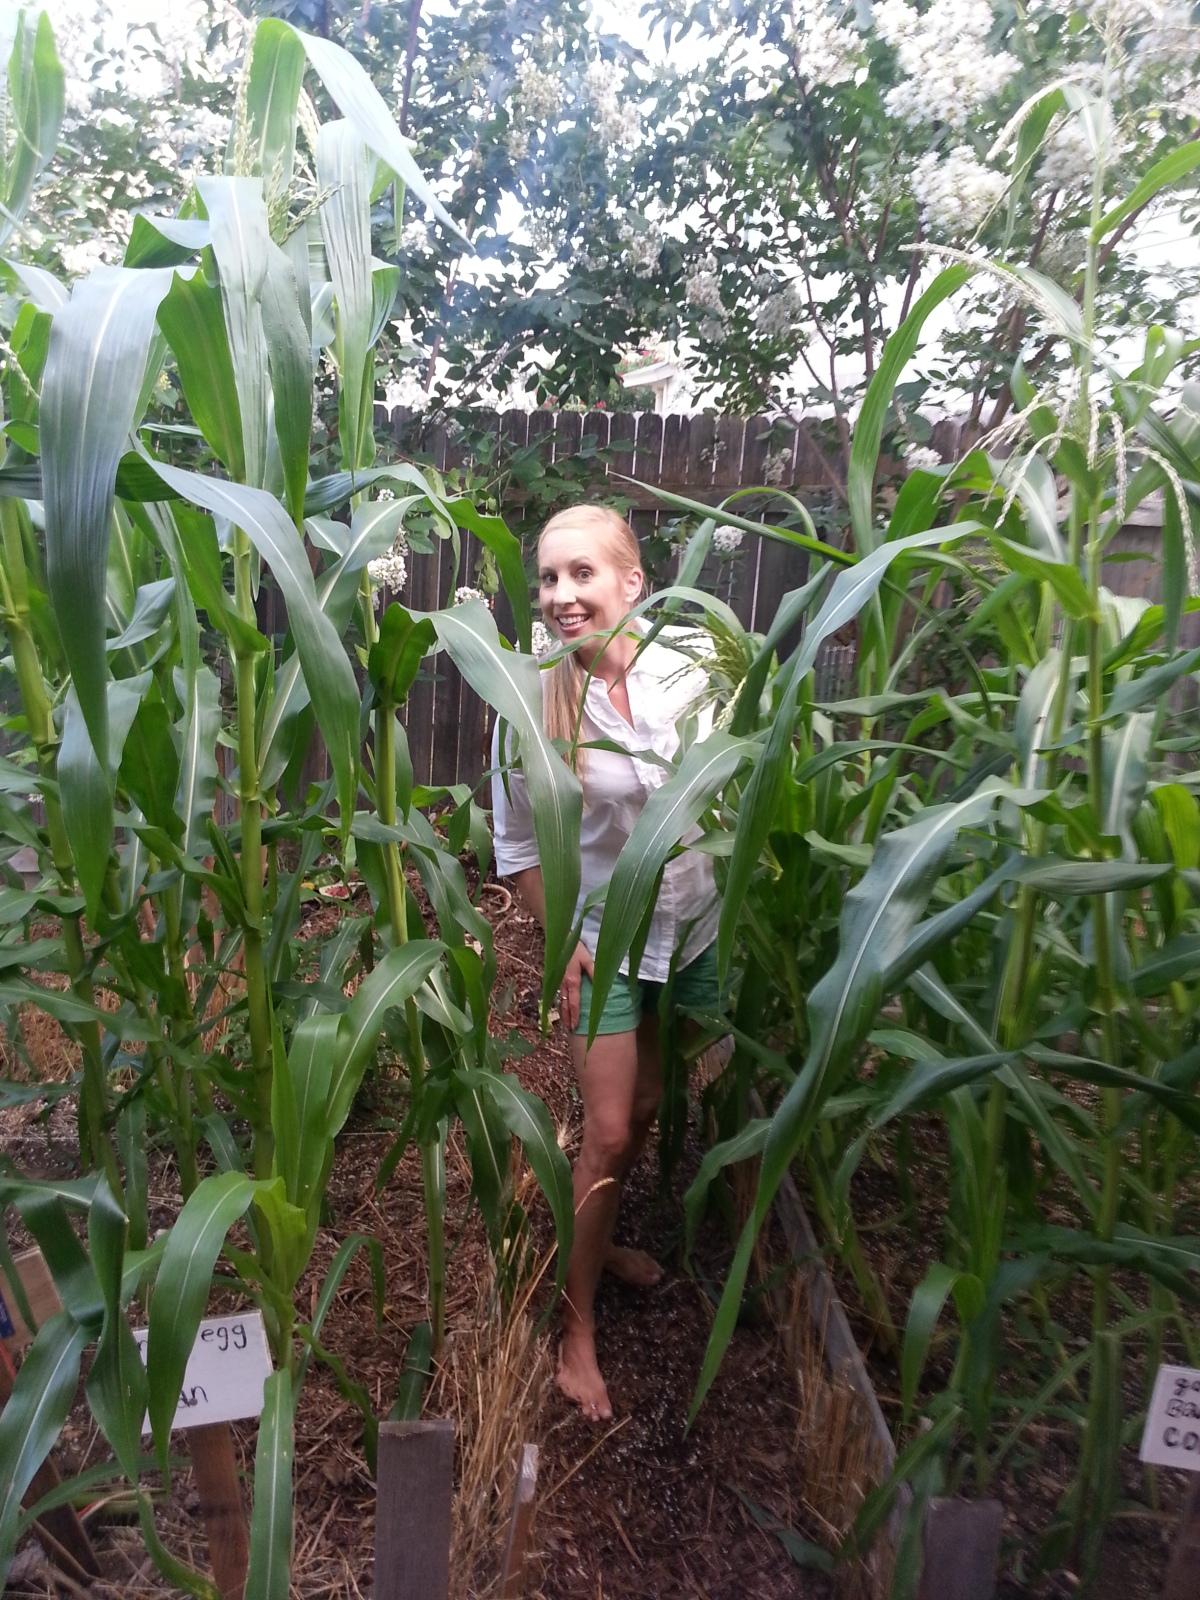 Yes, you can grow corn in a suburban backyard.